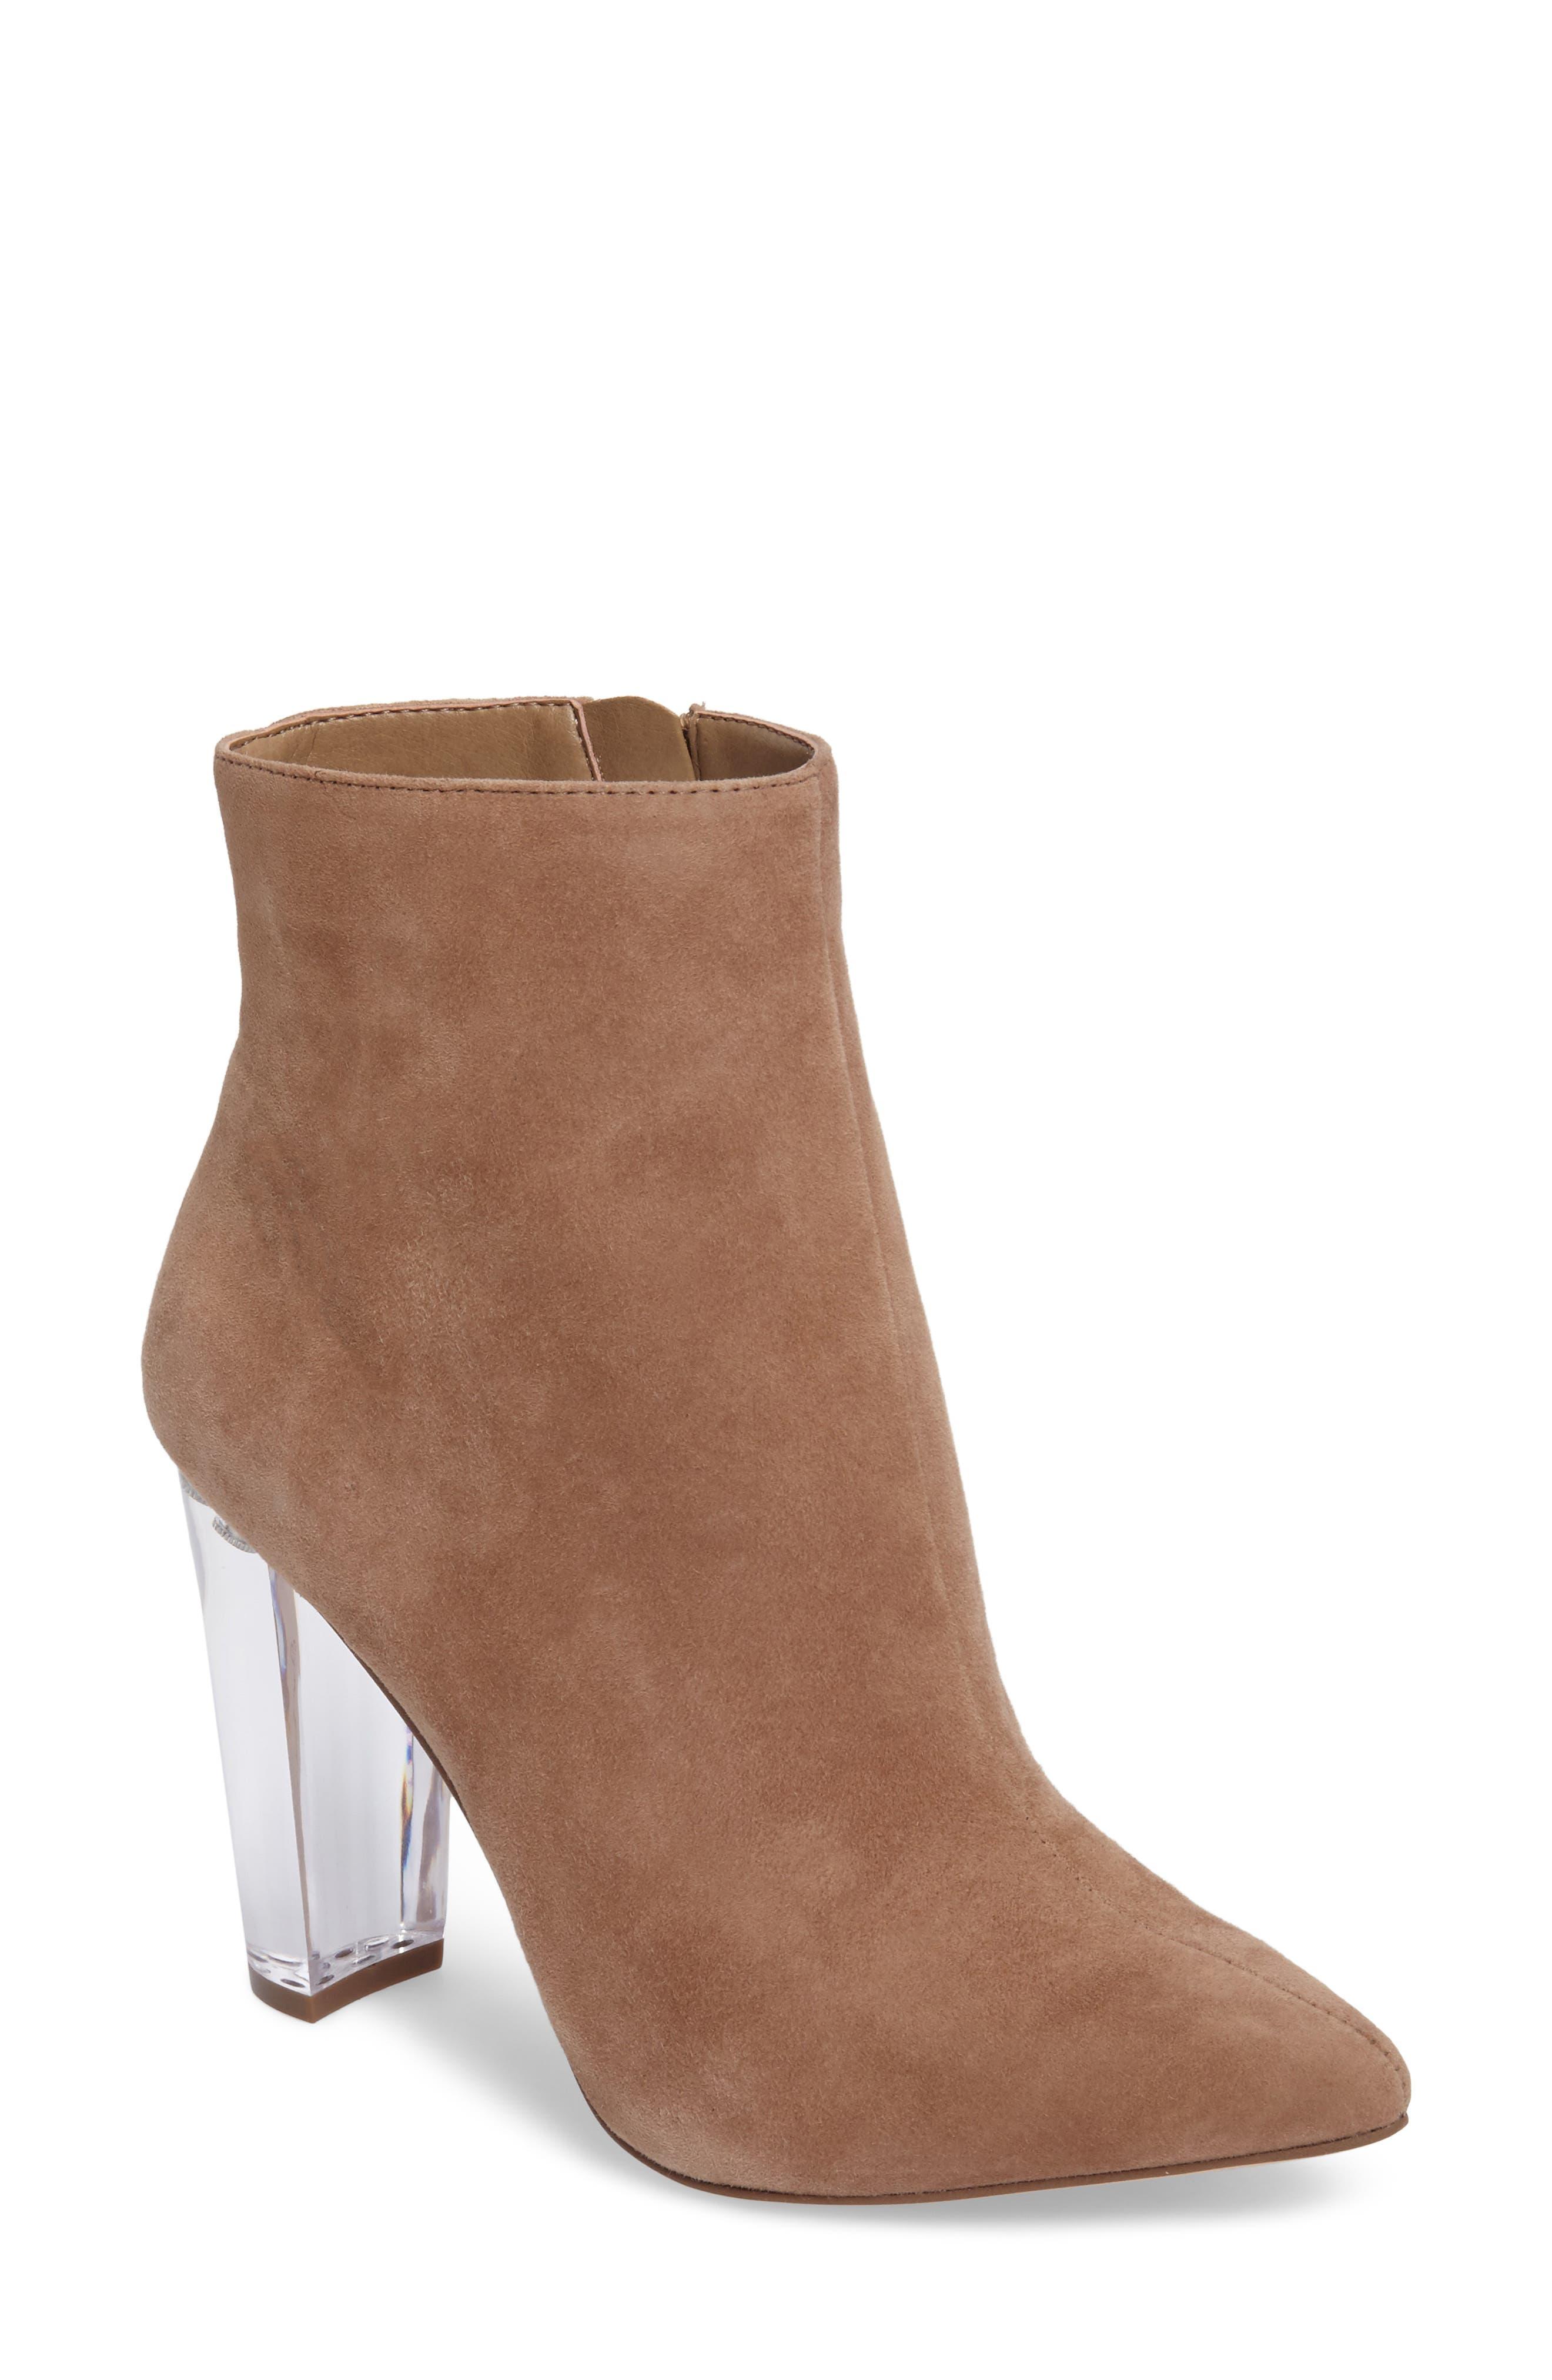 Alternate Image 1 Selected - Jessica Simpson Teddi Crescent-Heel Bootie (Women)